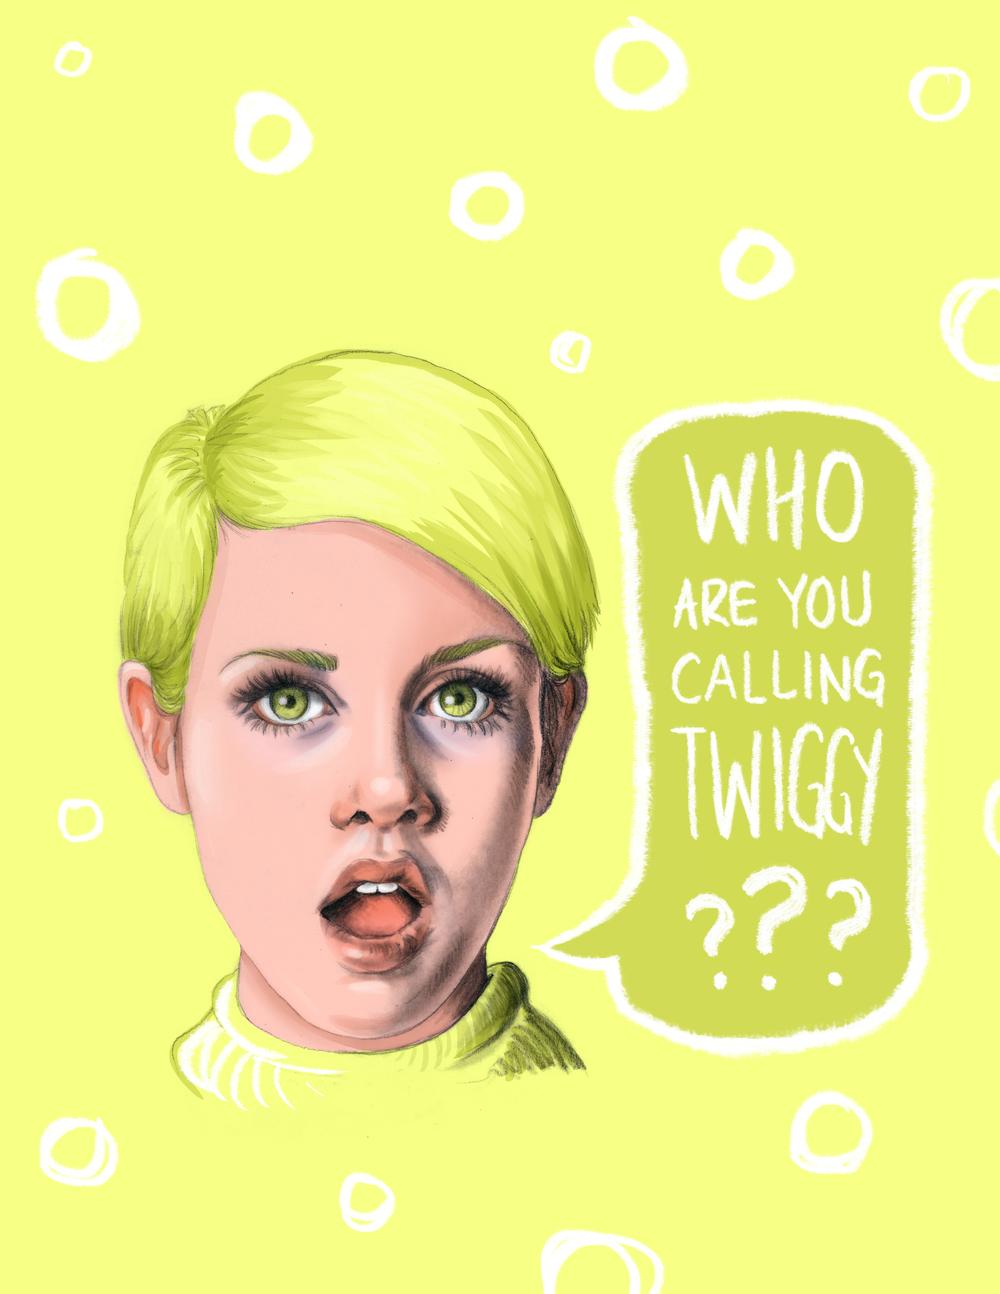 Brianna_Parrish-twiggy.jpg